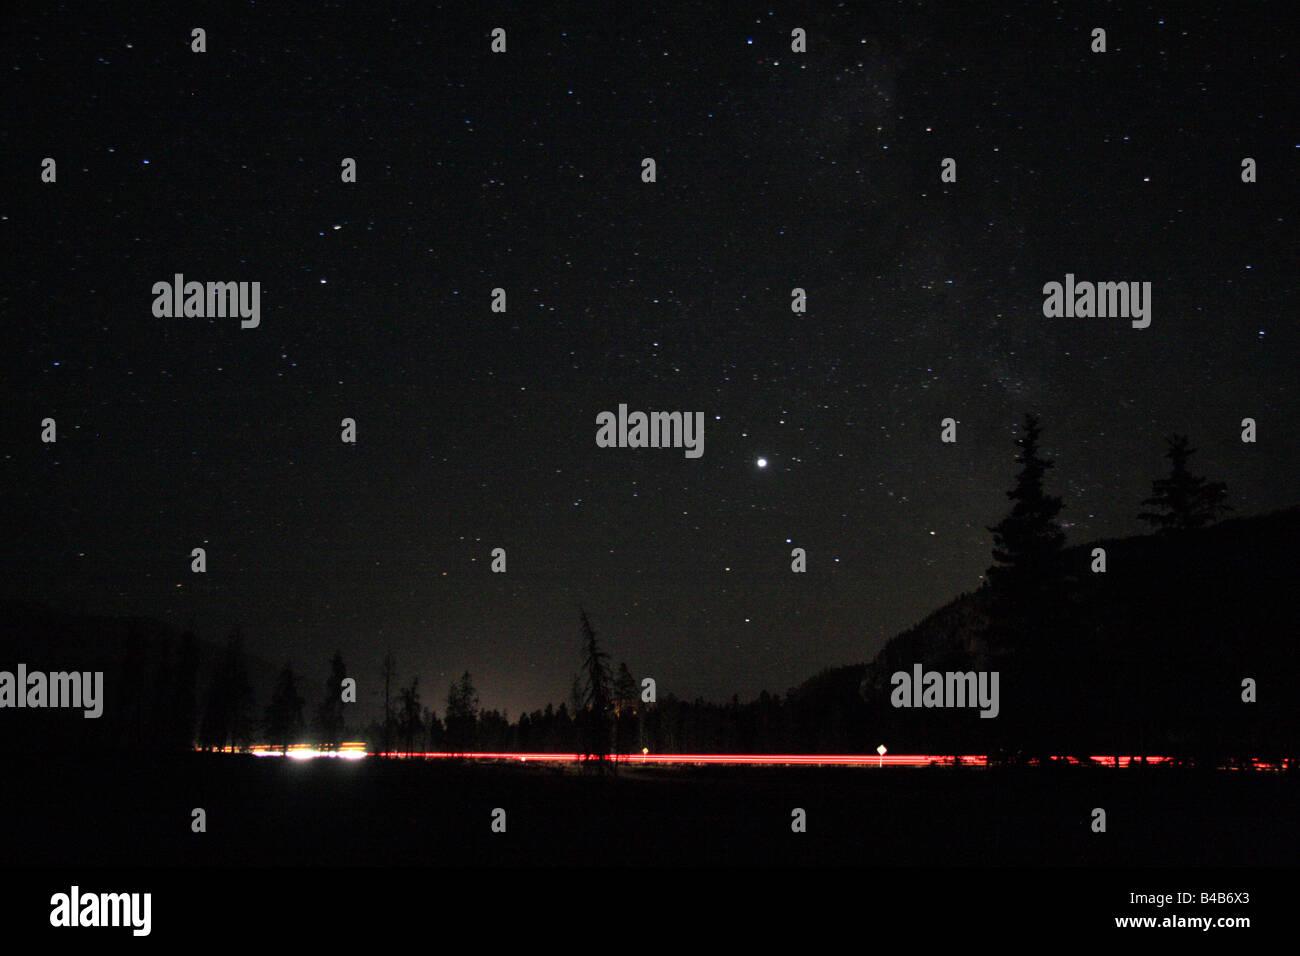 Dark starry skies in Jasper National Park, Alberta - Stock Image